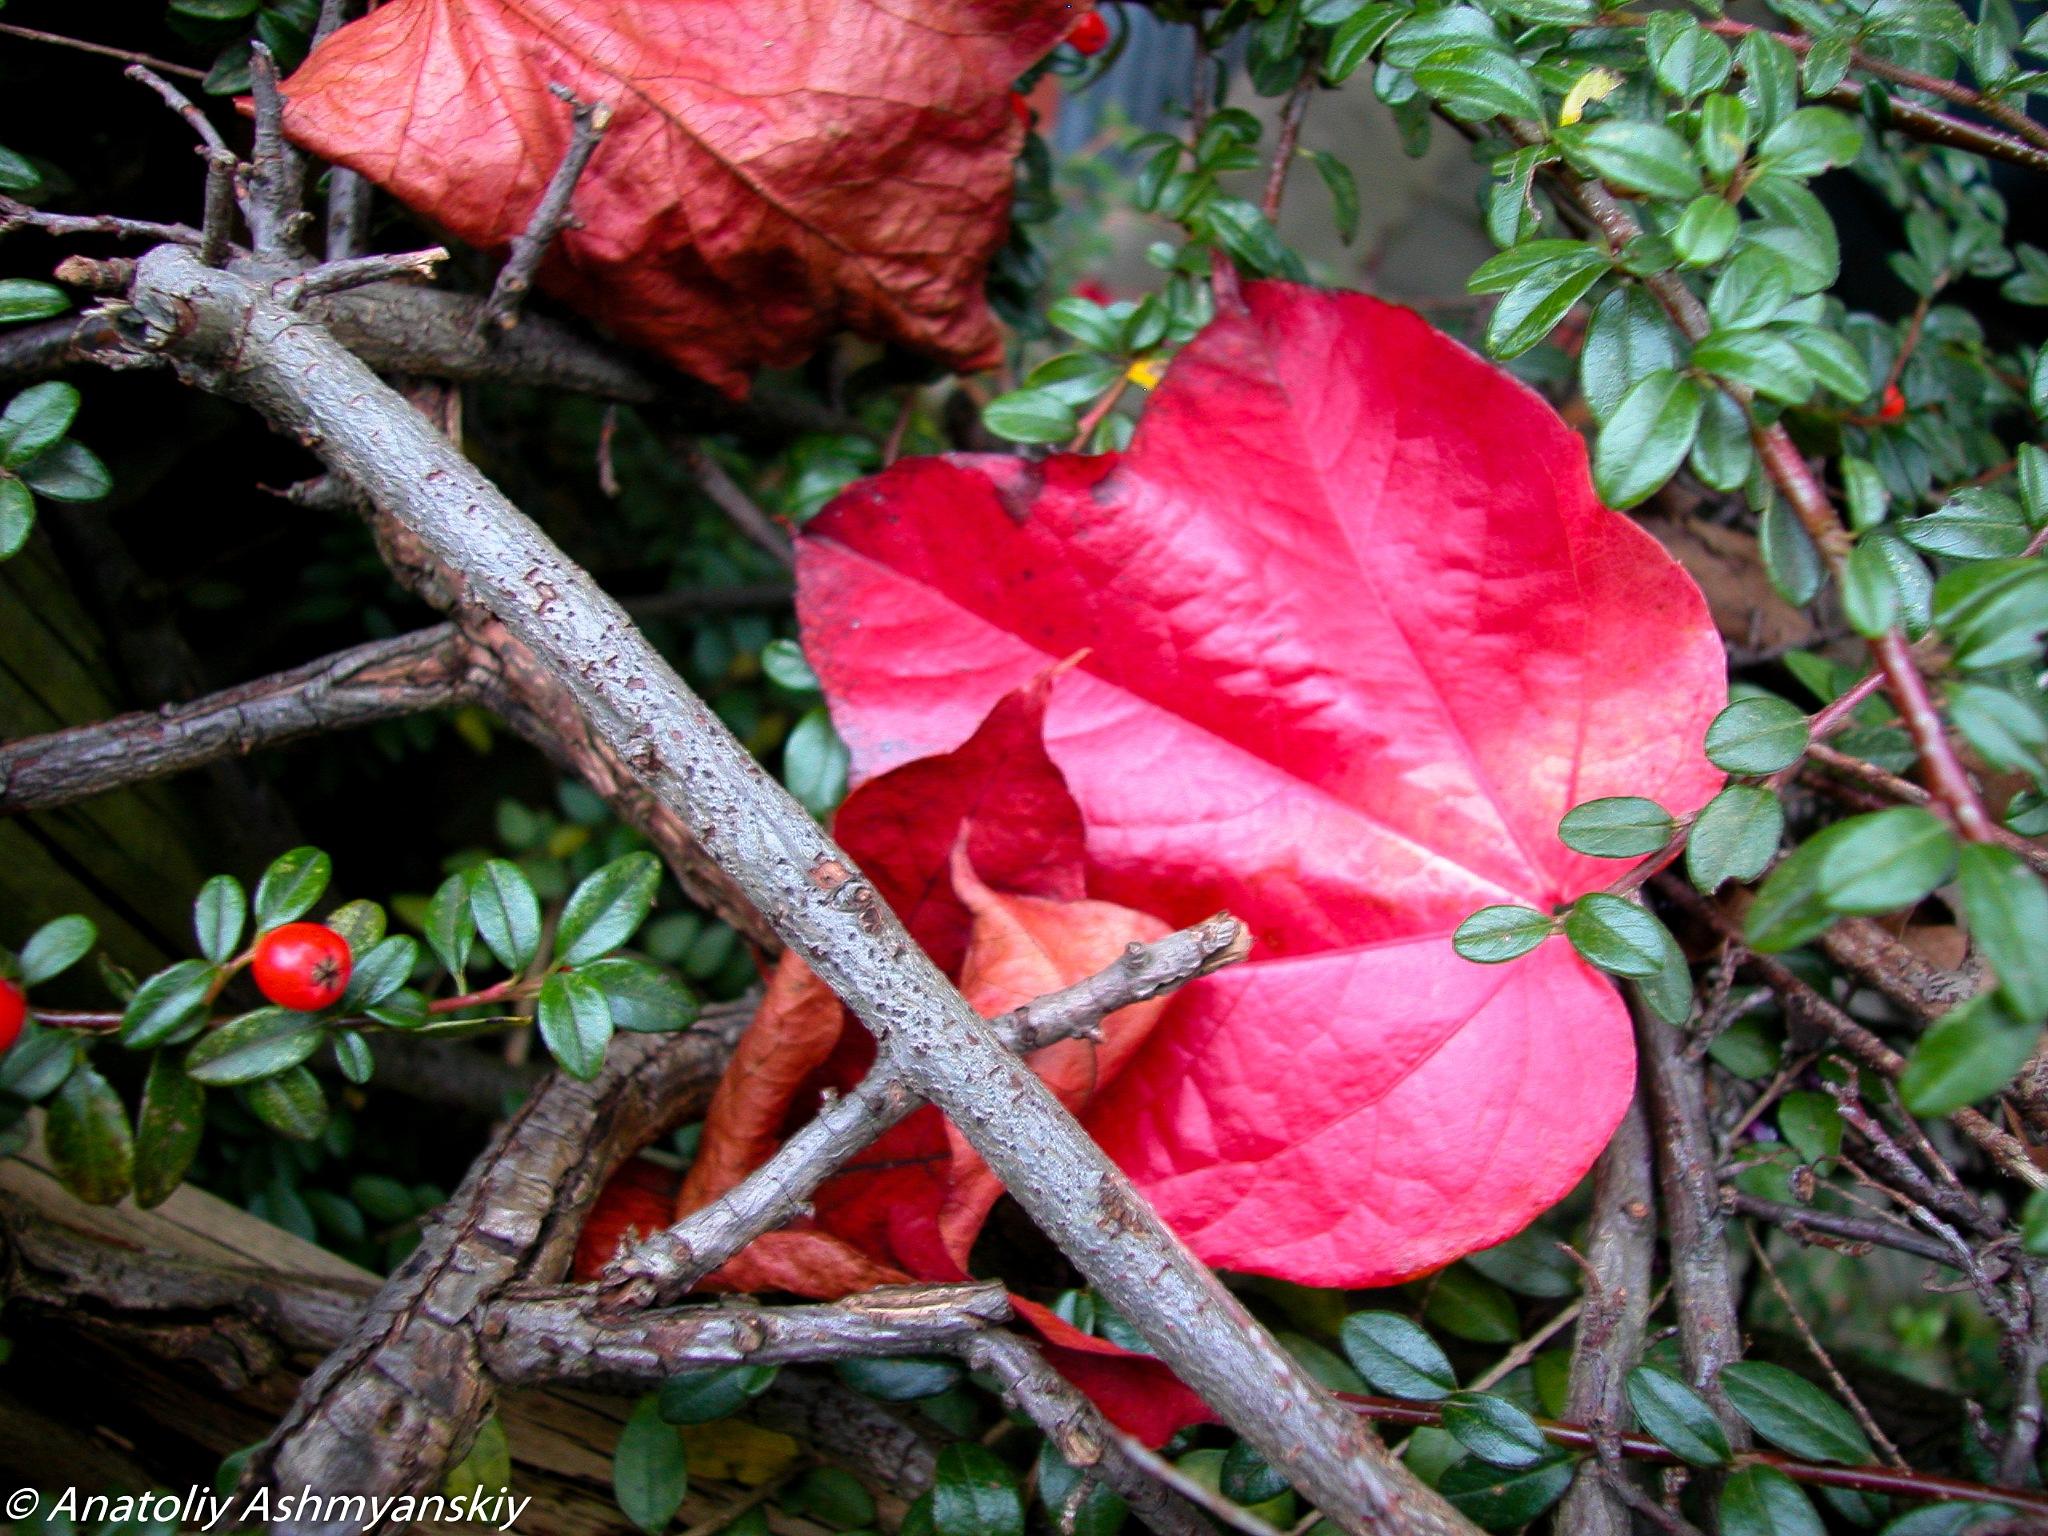 Autumn leaf by Anatoliy Ashmyanskiy